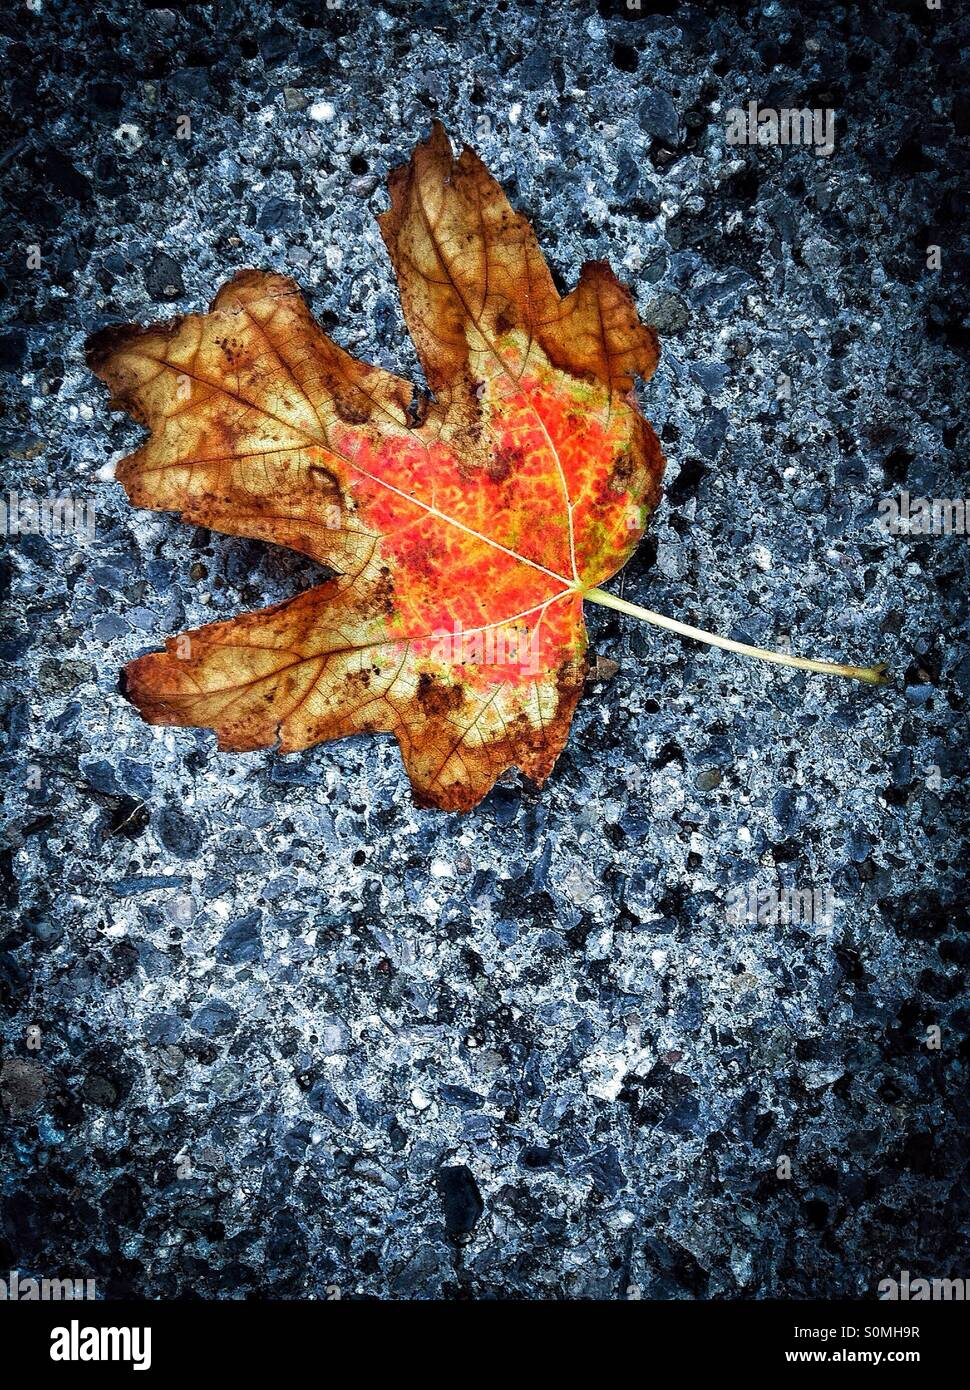 Autumn colors on asphalt. Colorful leaf on the floor. Stock Photo